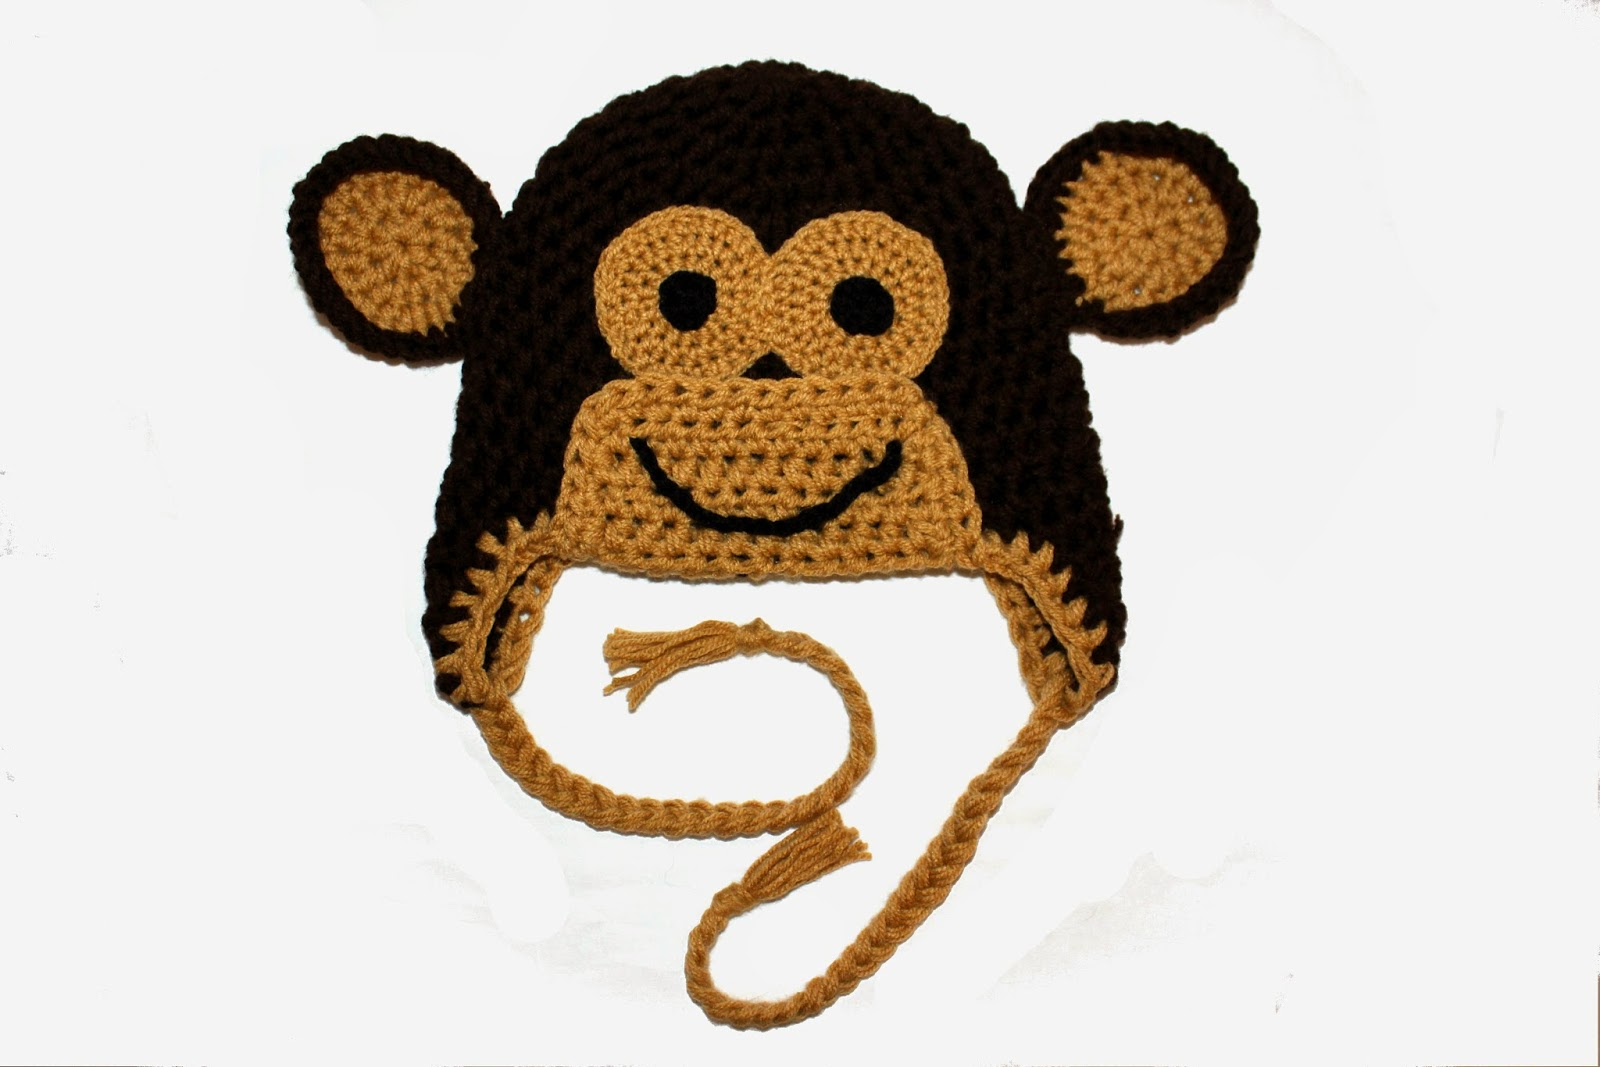 czapka małpa, czapka małpka, czapeczka małpa, małpka, czapeczka pilotka, czapka pilotka